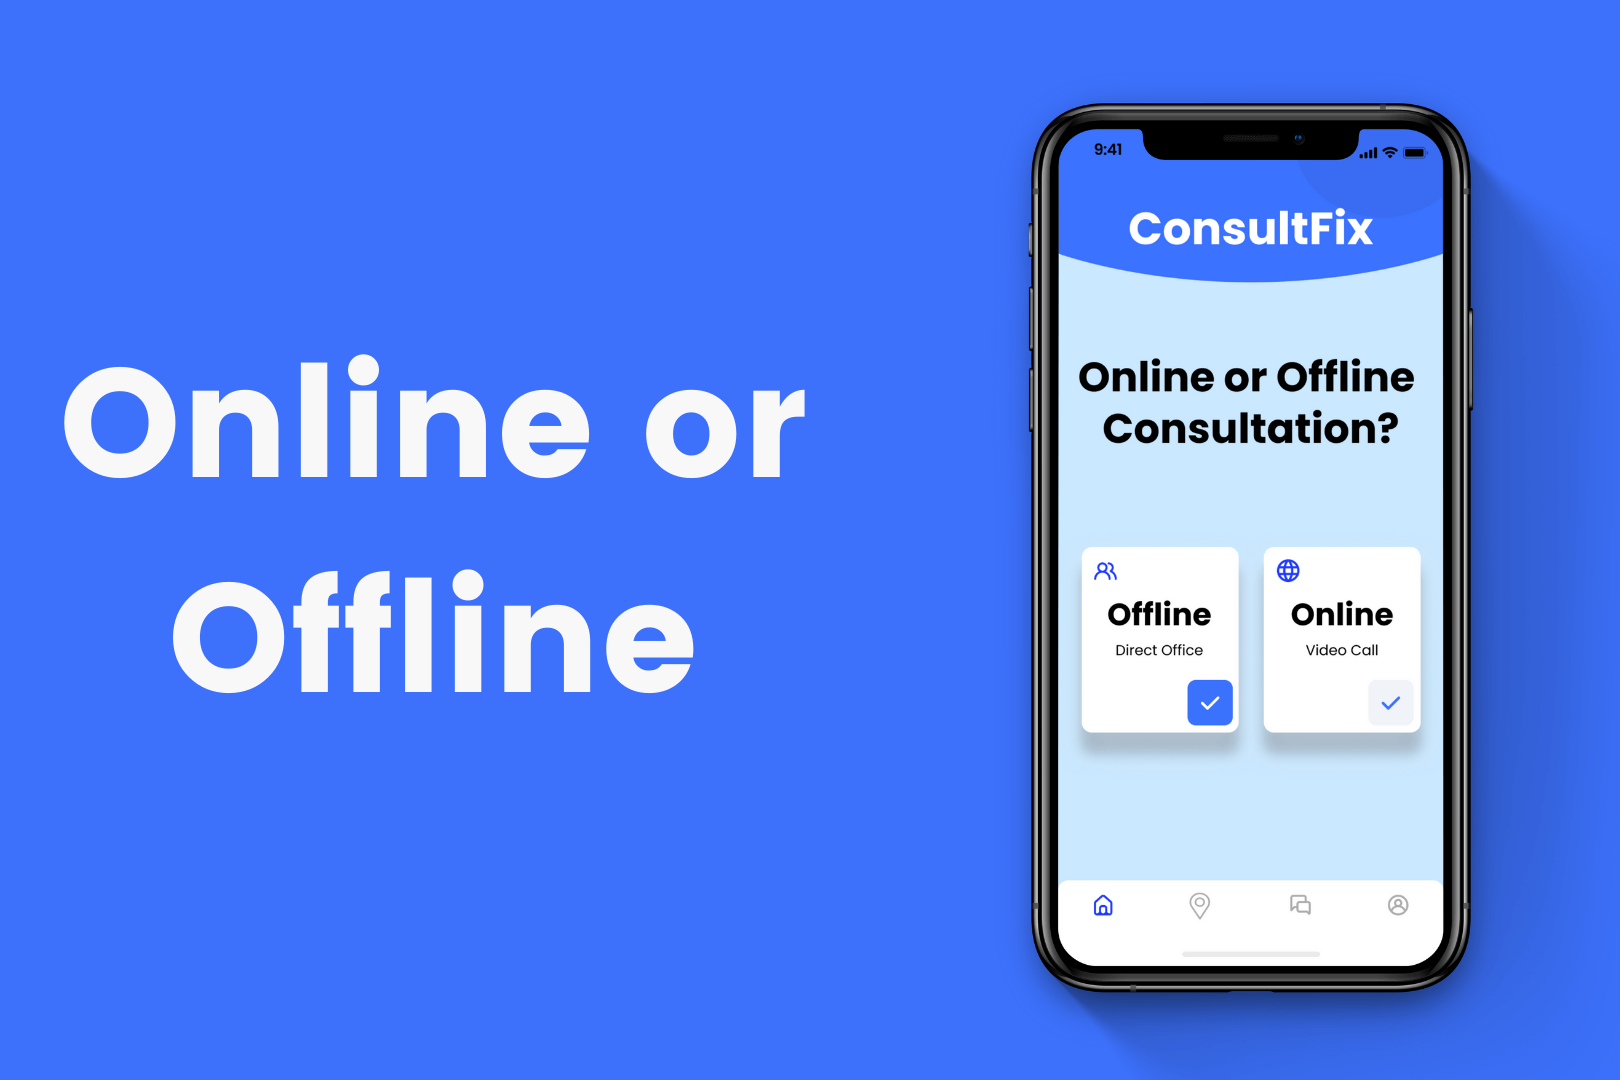 Online or Offline Consultation